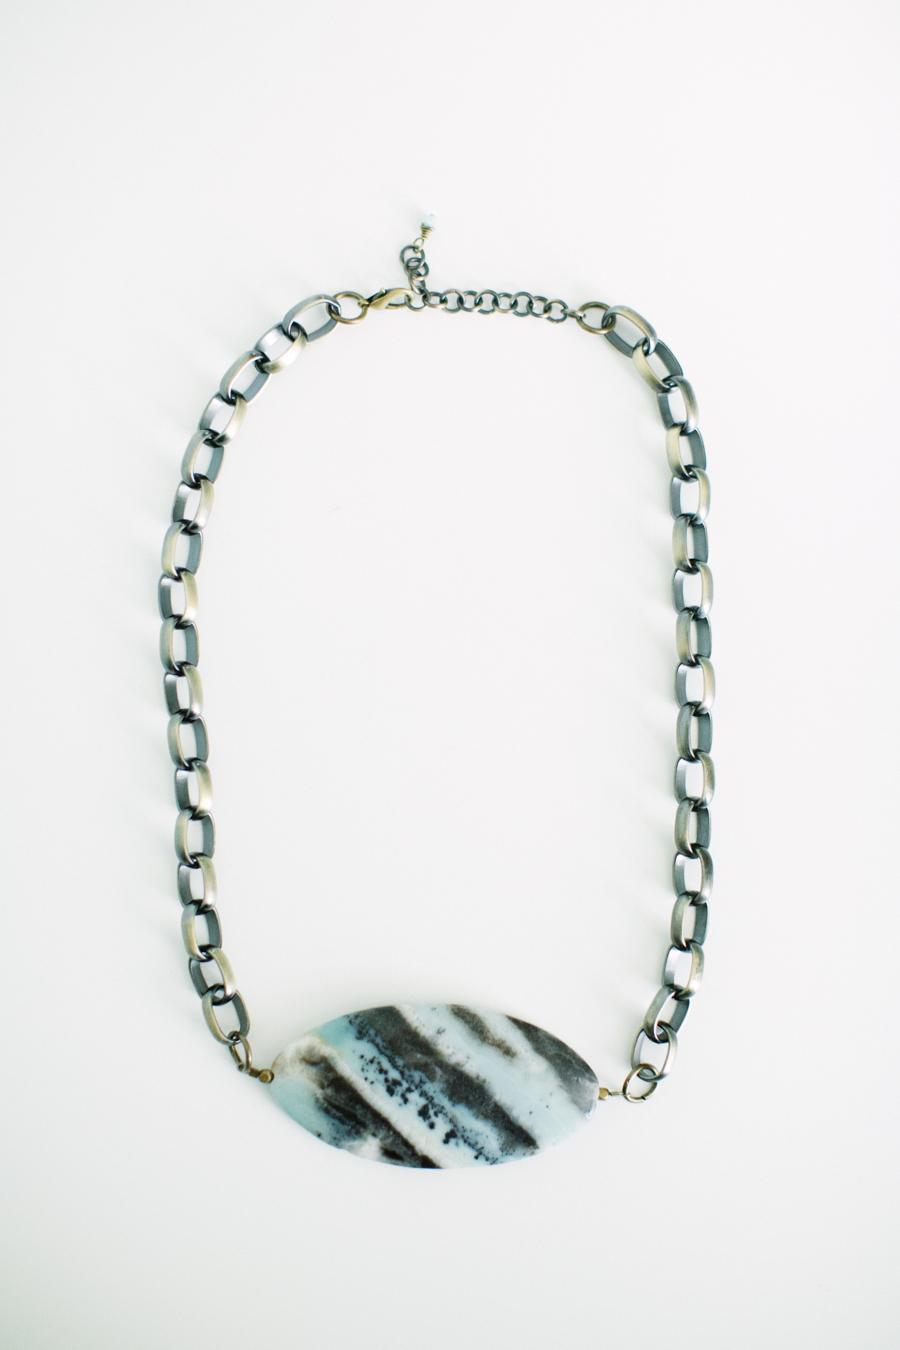 Jewelry-MackenzieKern-5.jpg